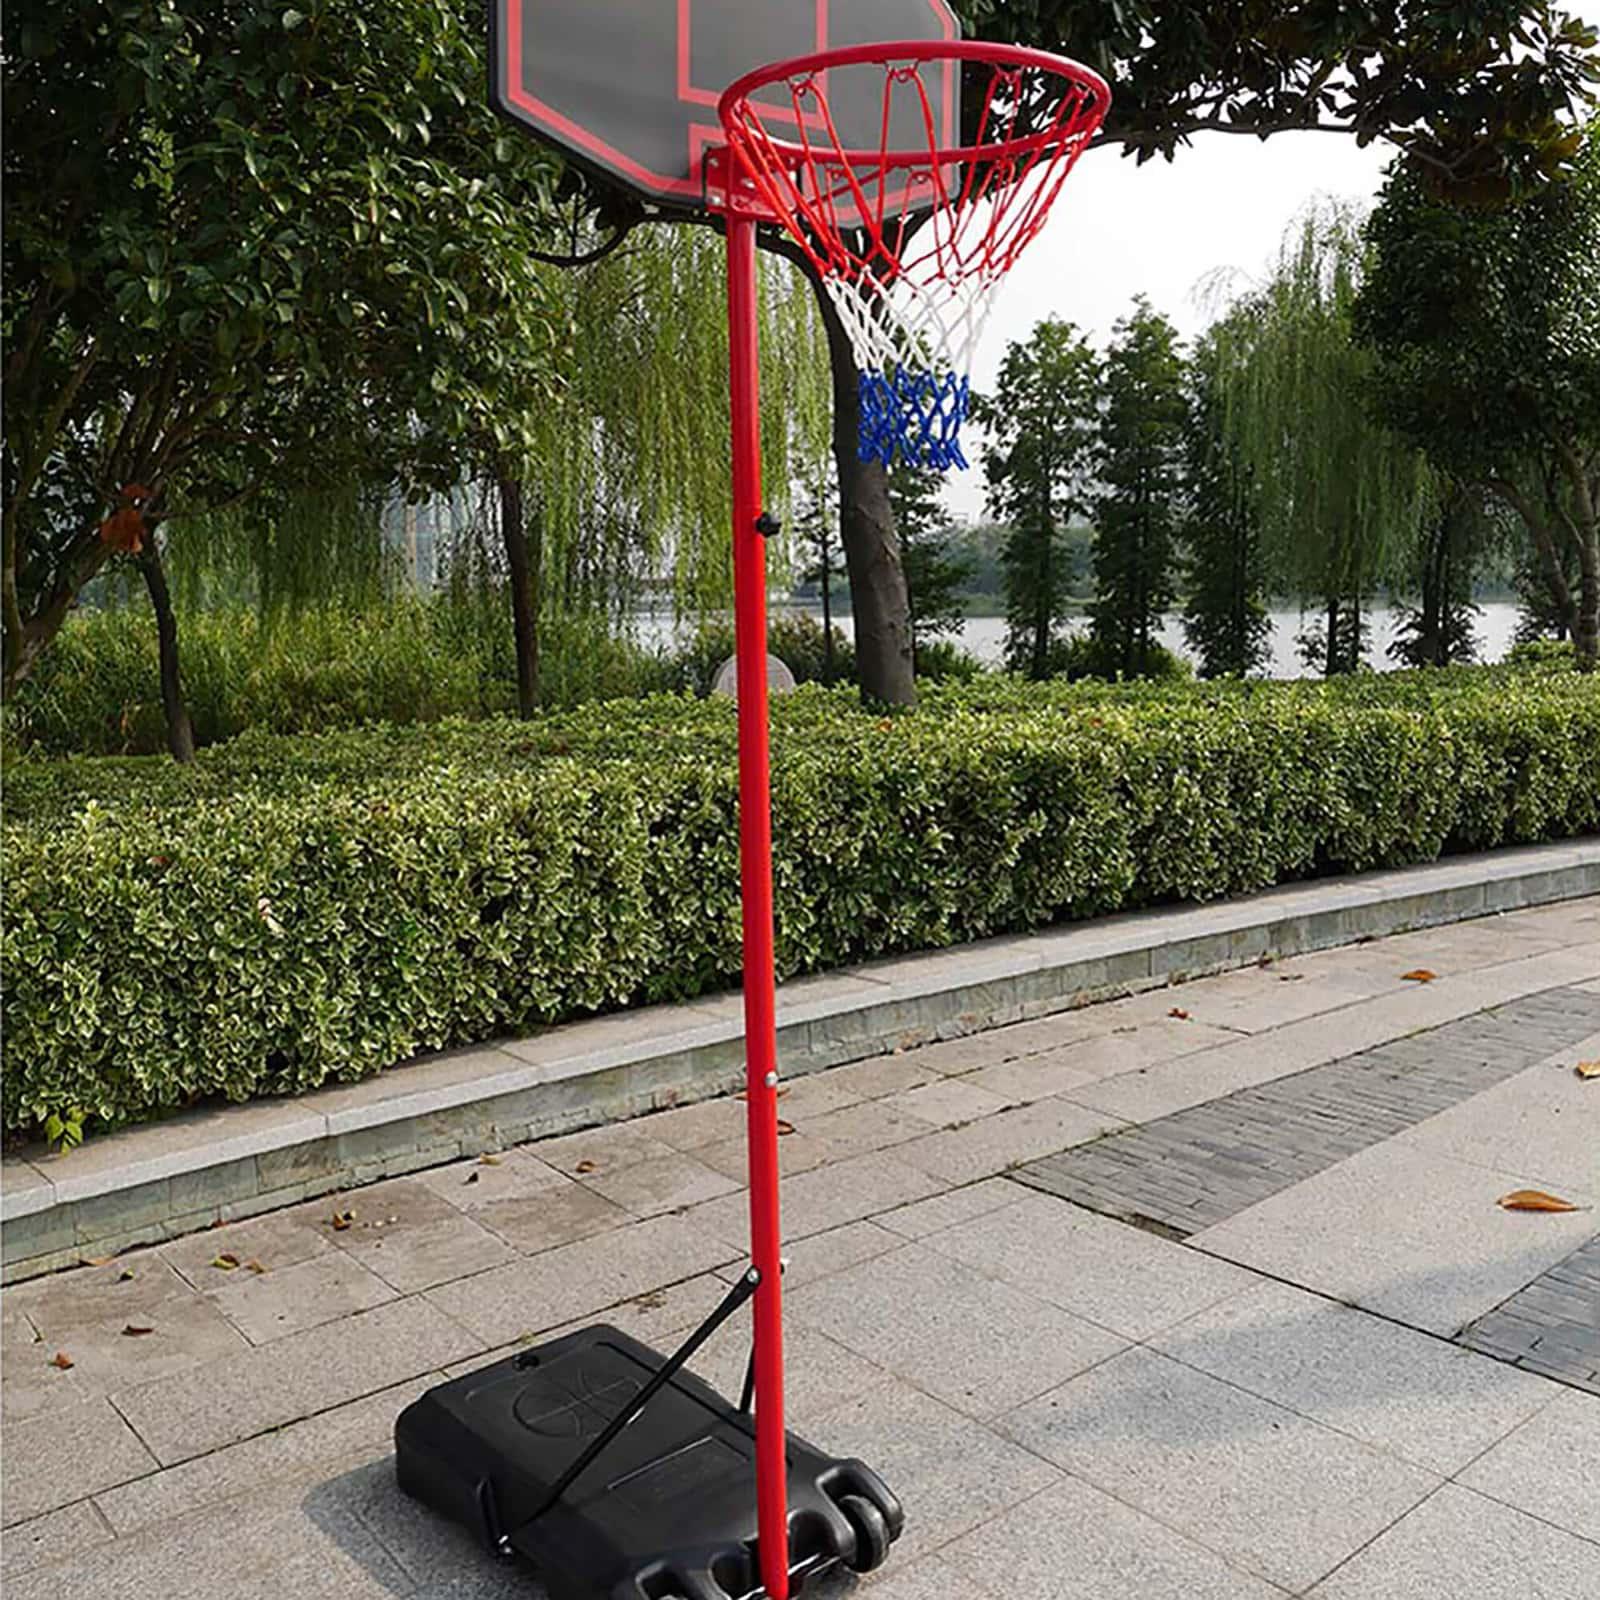 <strong>Put Up a Basketball Hoop</strong>